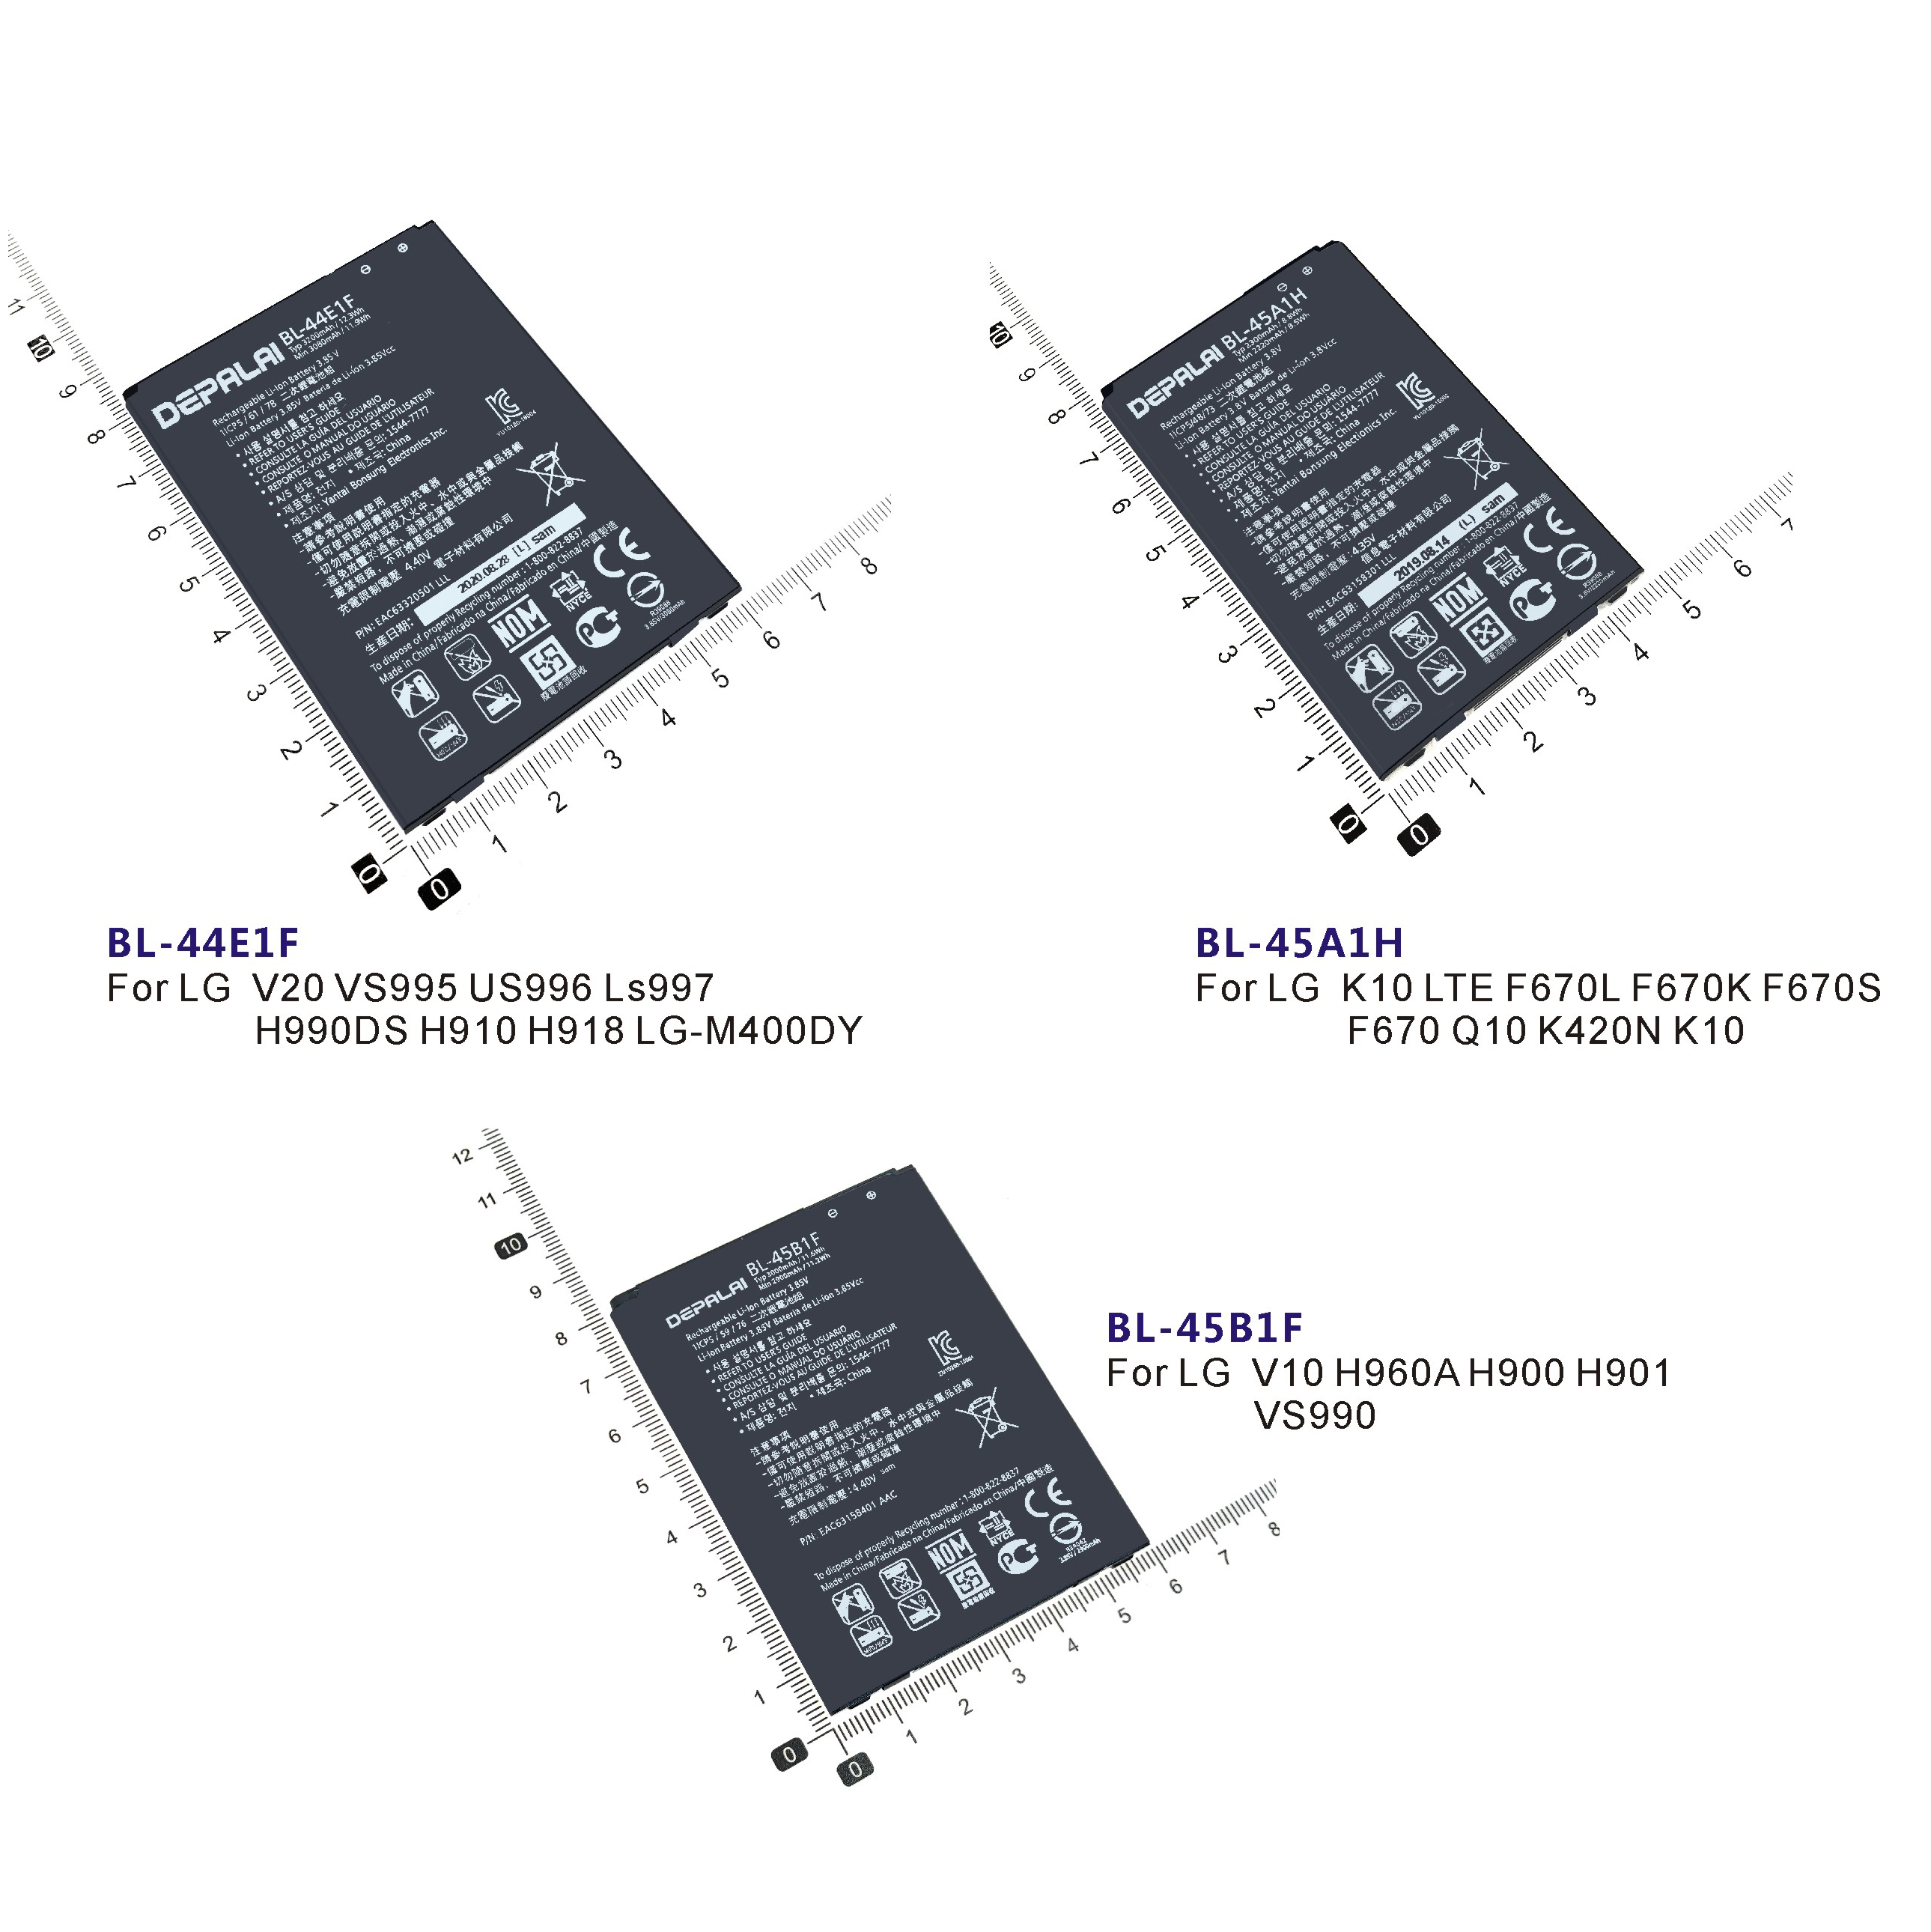 Телефон Батарея BL-44E1F BL-45A1H BL-45B1F для LG V20 VS995 US996 LS997 K10 LTE F670L K S Q10 K420N V10 H960A H900 VS990 батареи